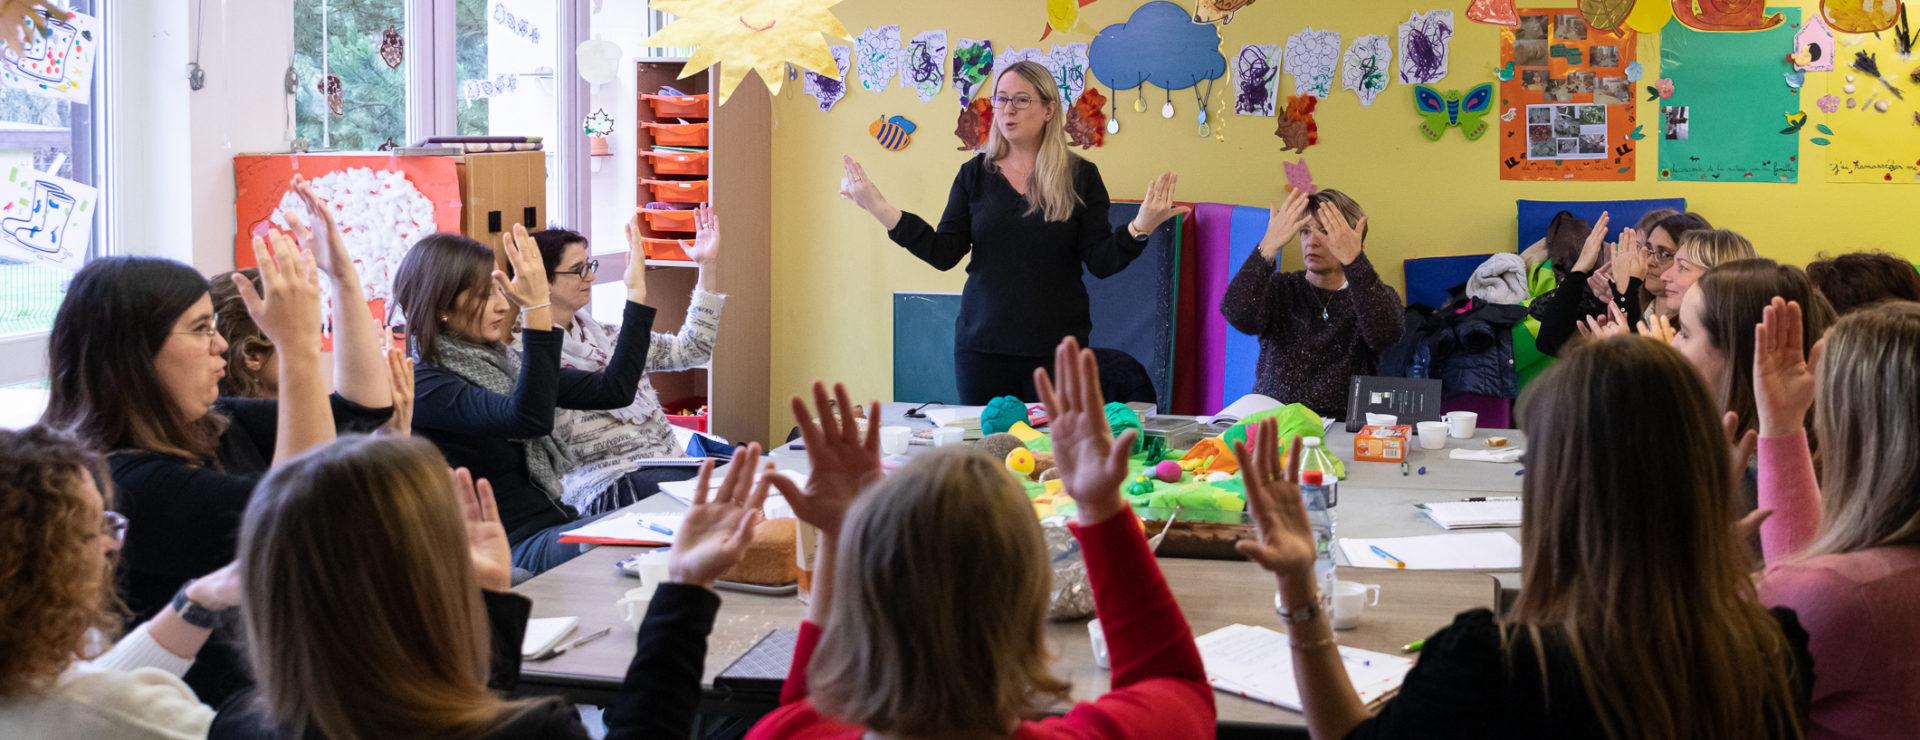 formation en communication gestuelle